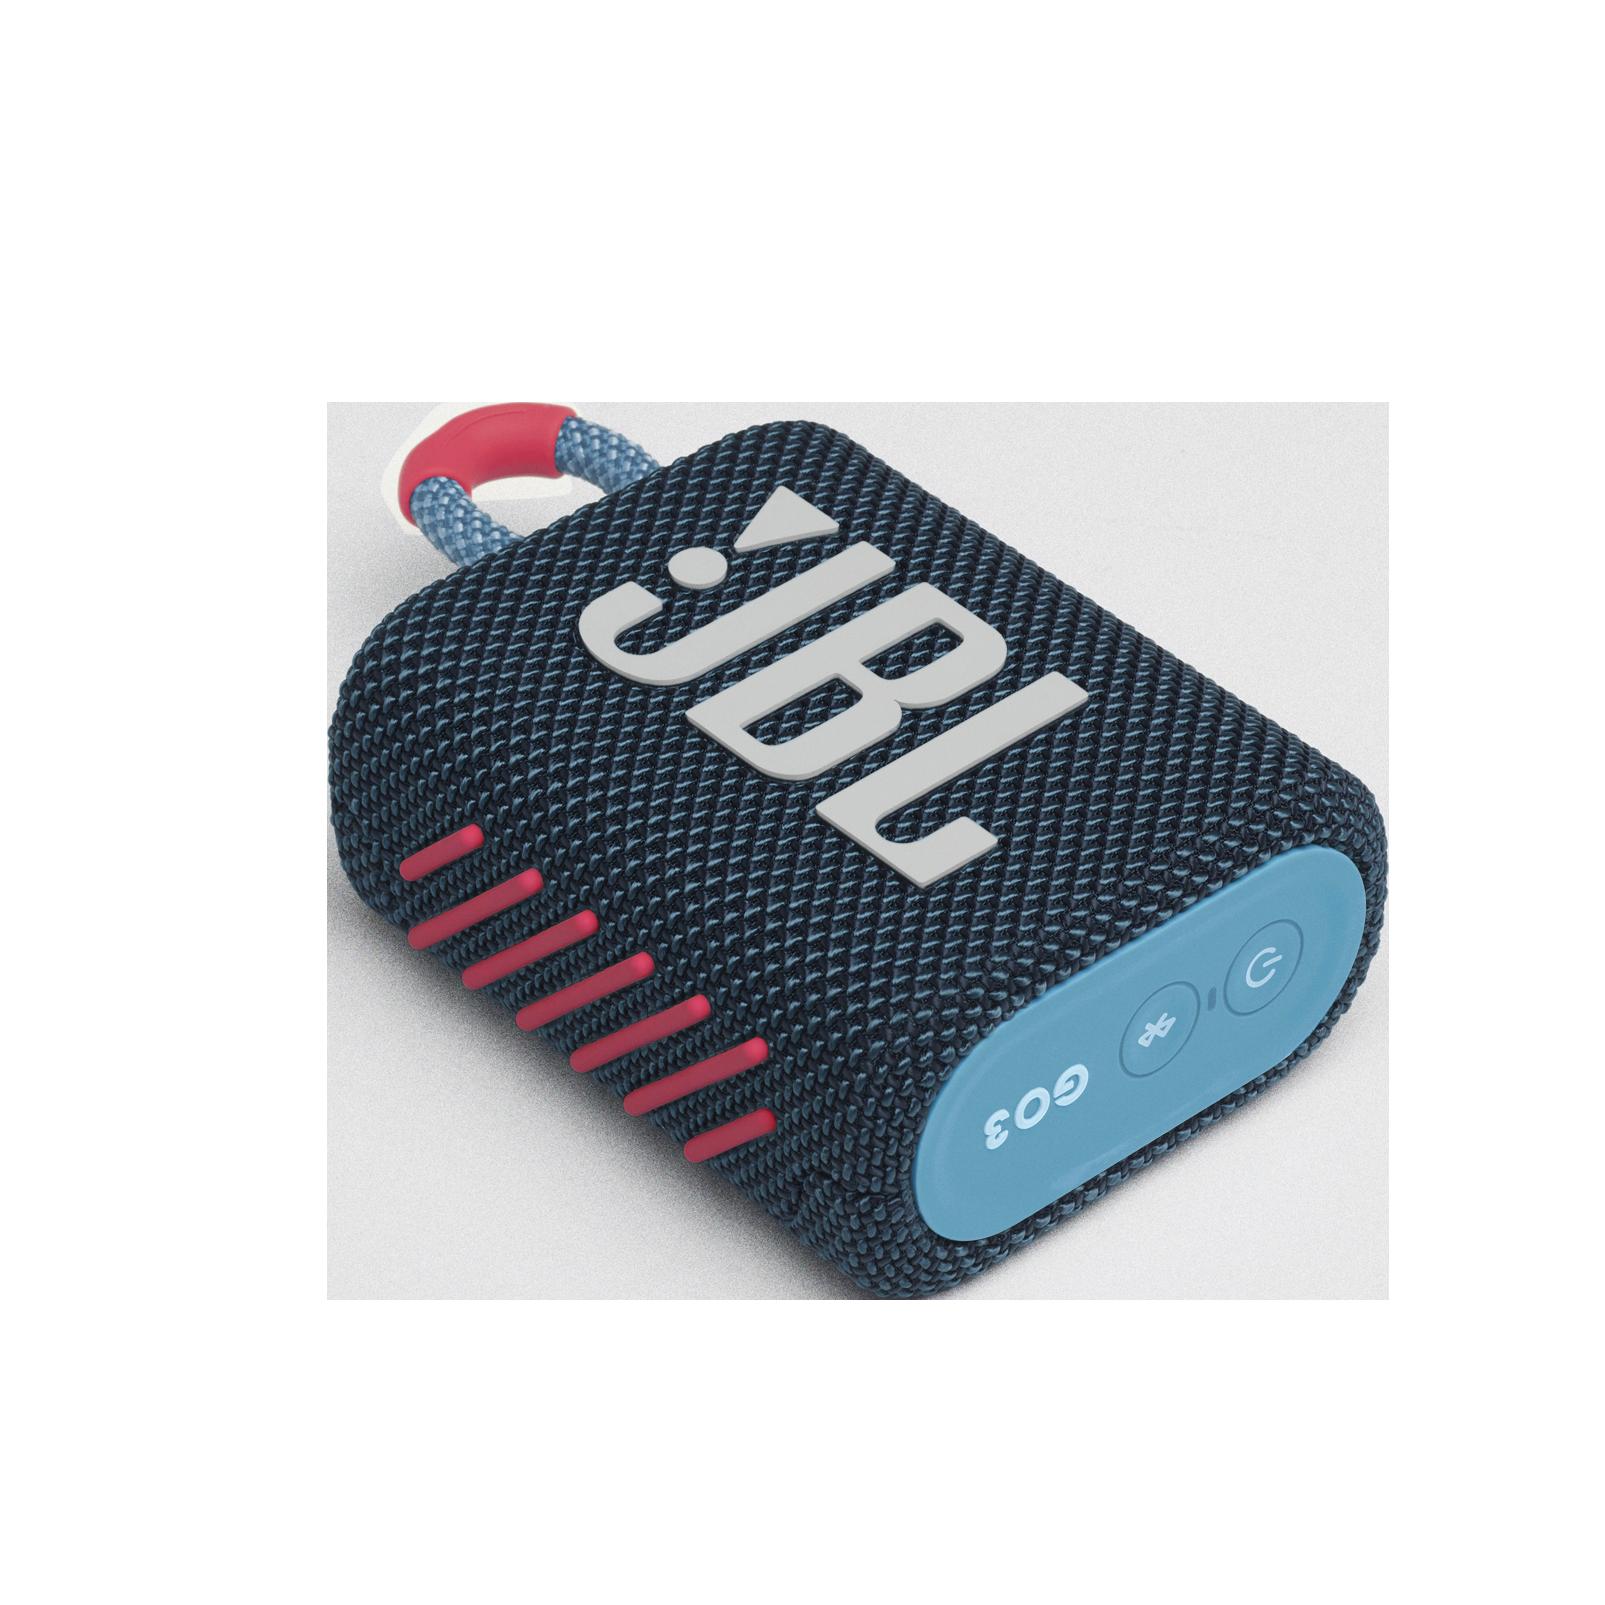 JBL GO 3 - Blue / Pink - Portable Waterproof Speaker - Detailshot 3